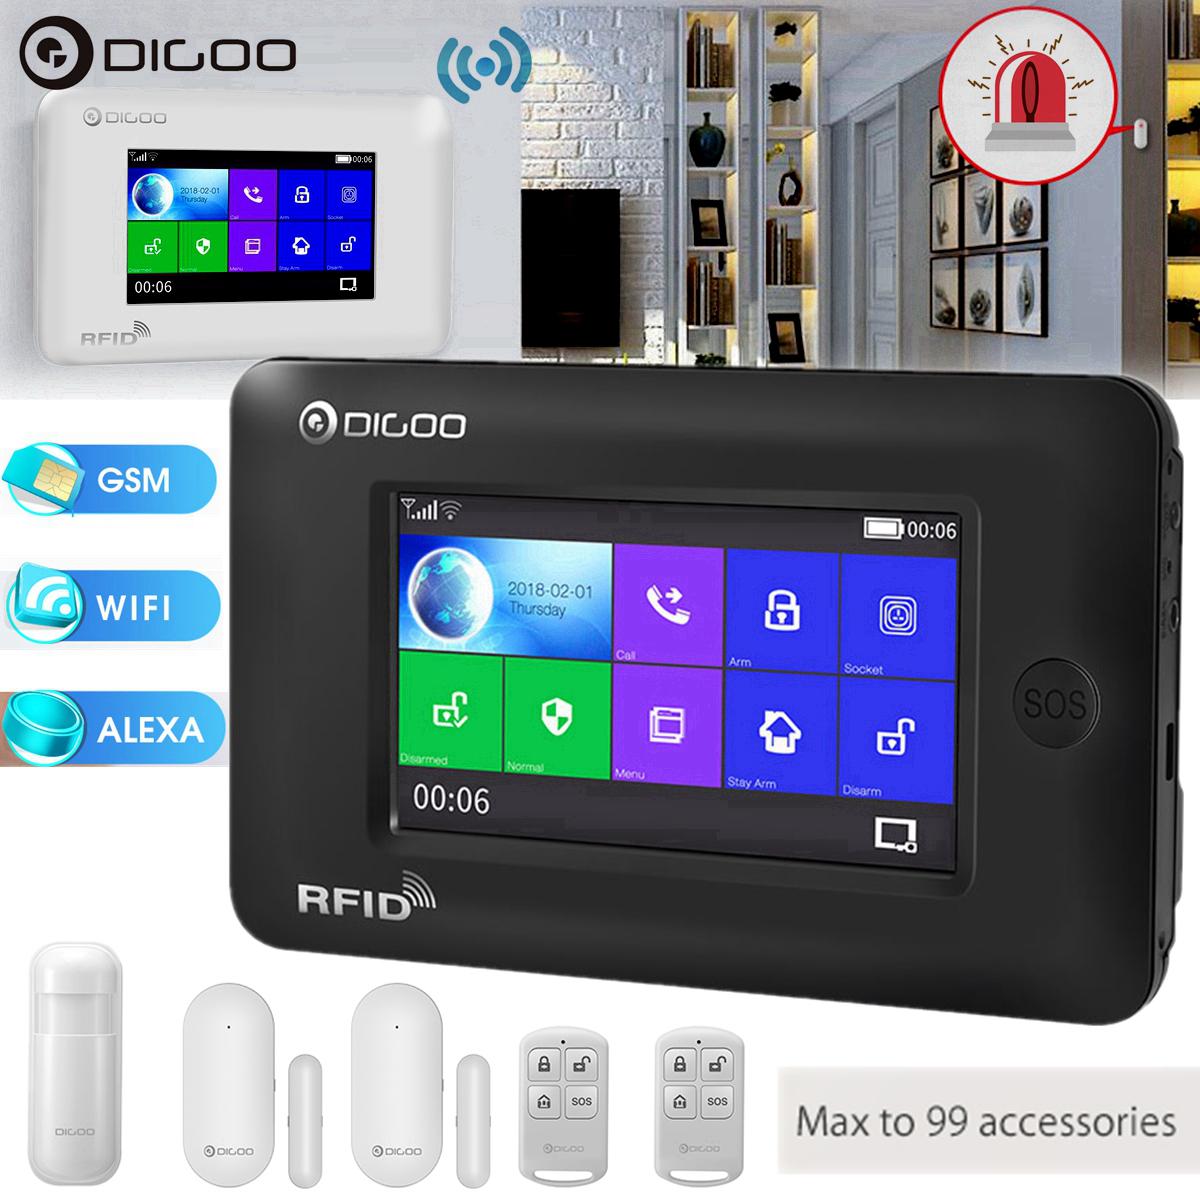 Digoo Hama Touch Screen Gsm Wifi Smart Home Burglar Security Alarm System Kit Https Uxs Home Security Alarm Home Security Alarm System Smart Home Security